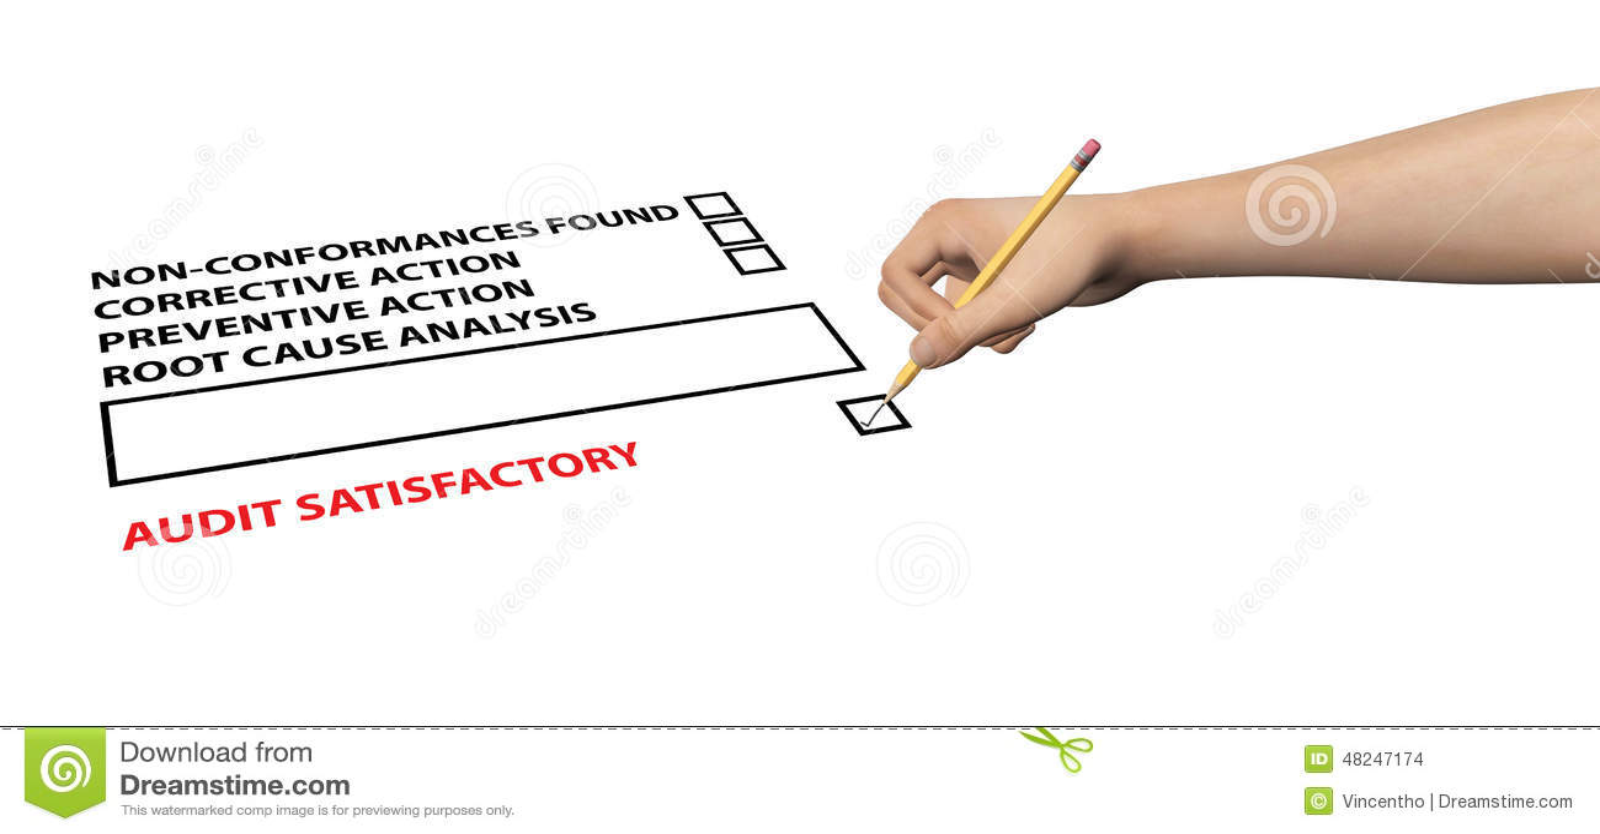 ISO Audit Checklist Satisfactory Illustration Stock Photo ...